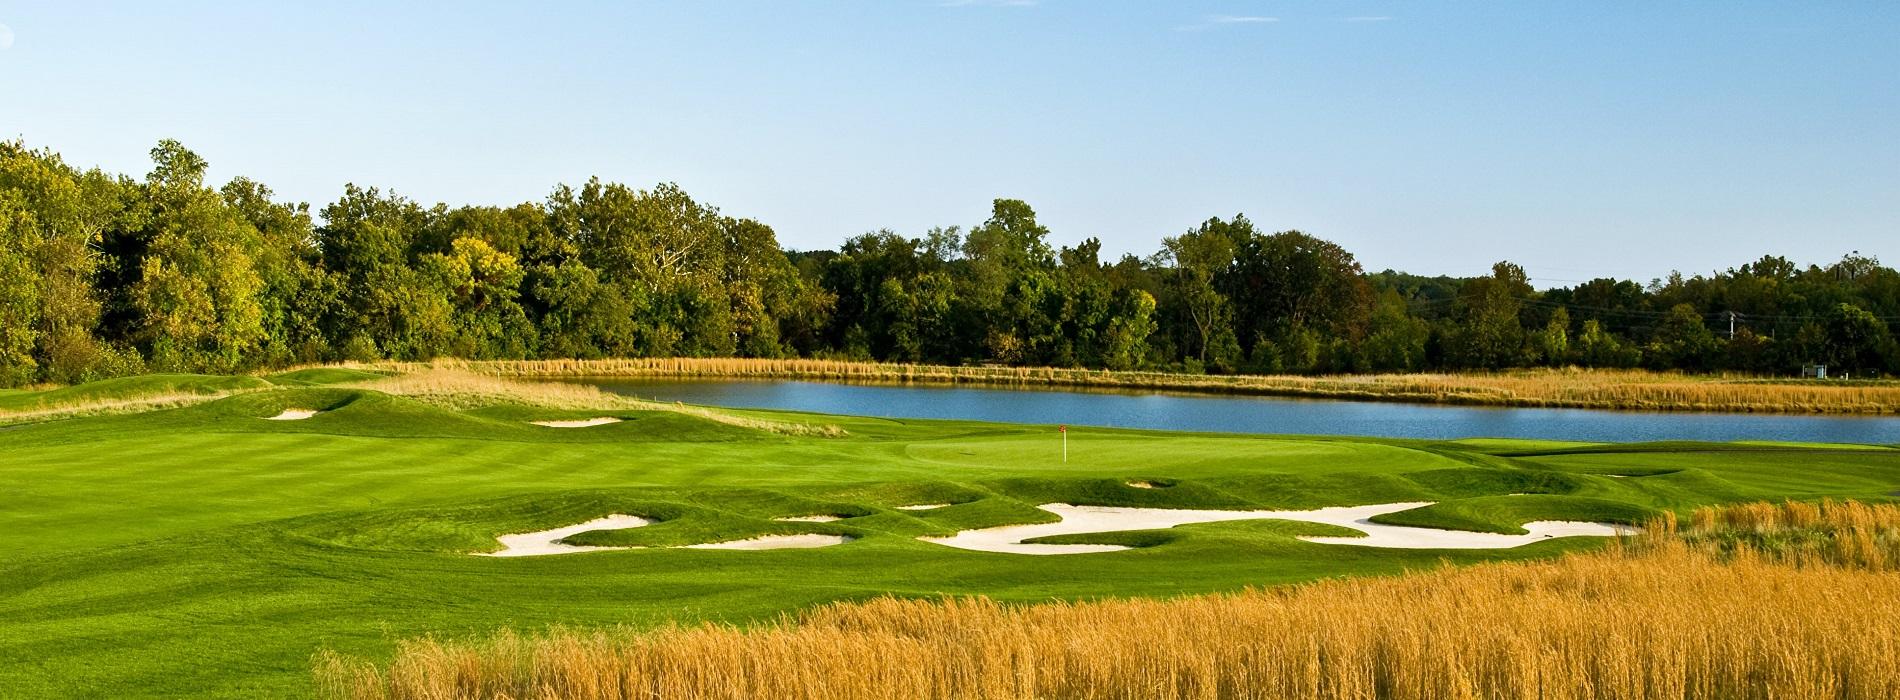 Golf America Television Show